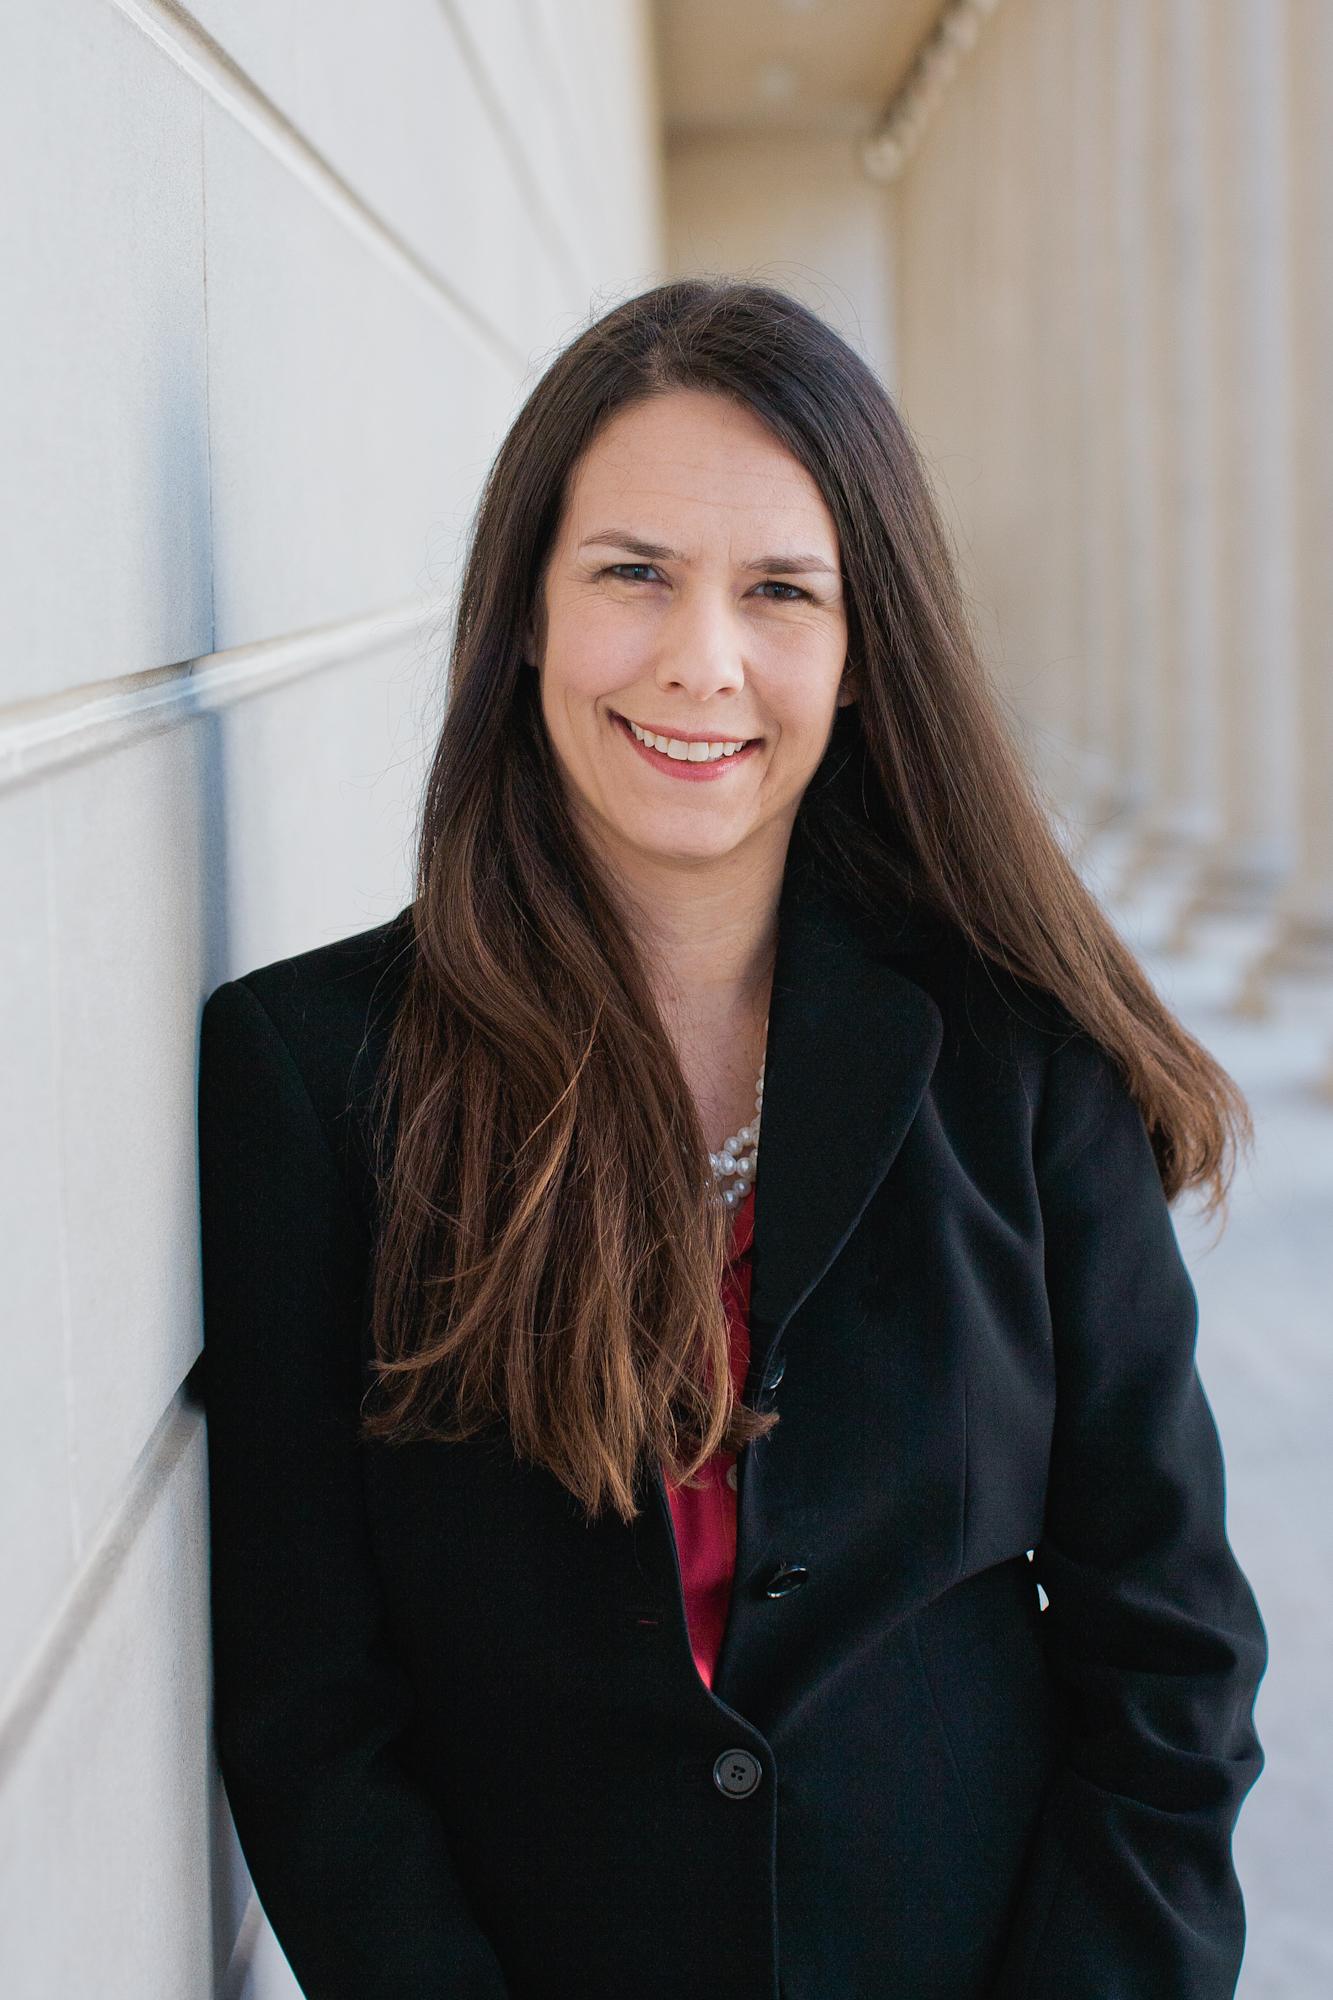 Lauren Cappelloni Estate Planning Attorney San Francisco Bay Area